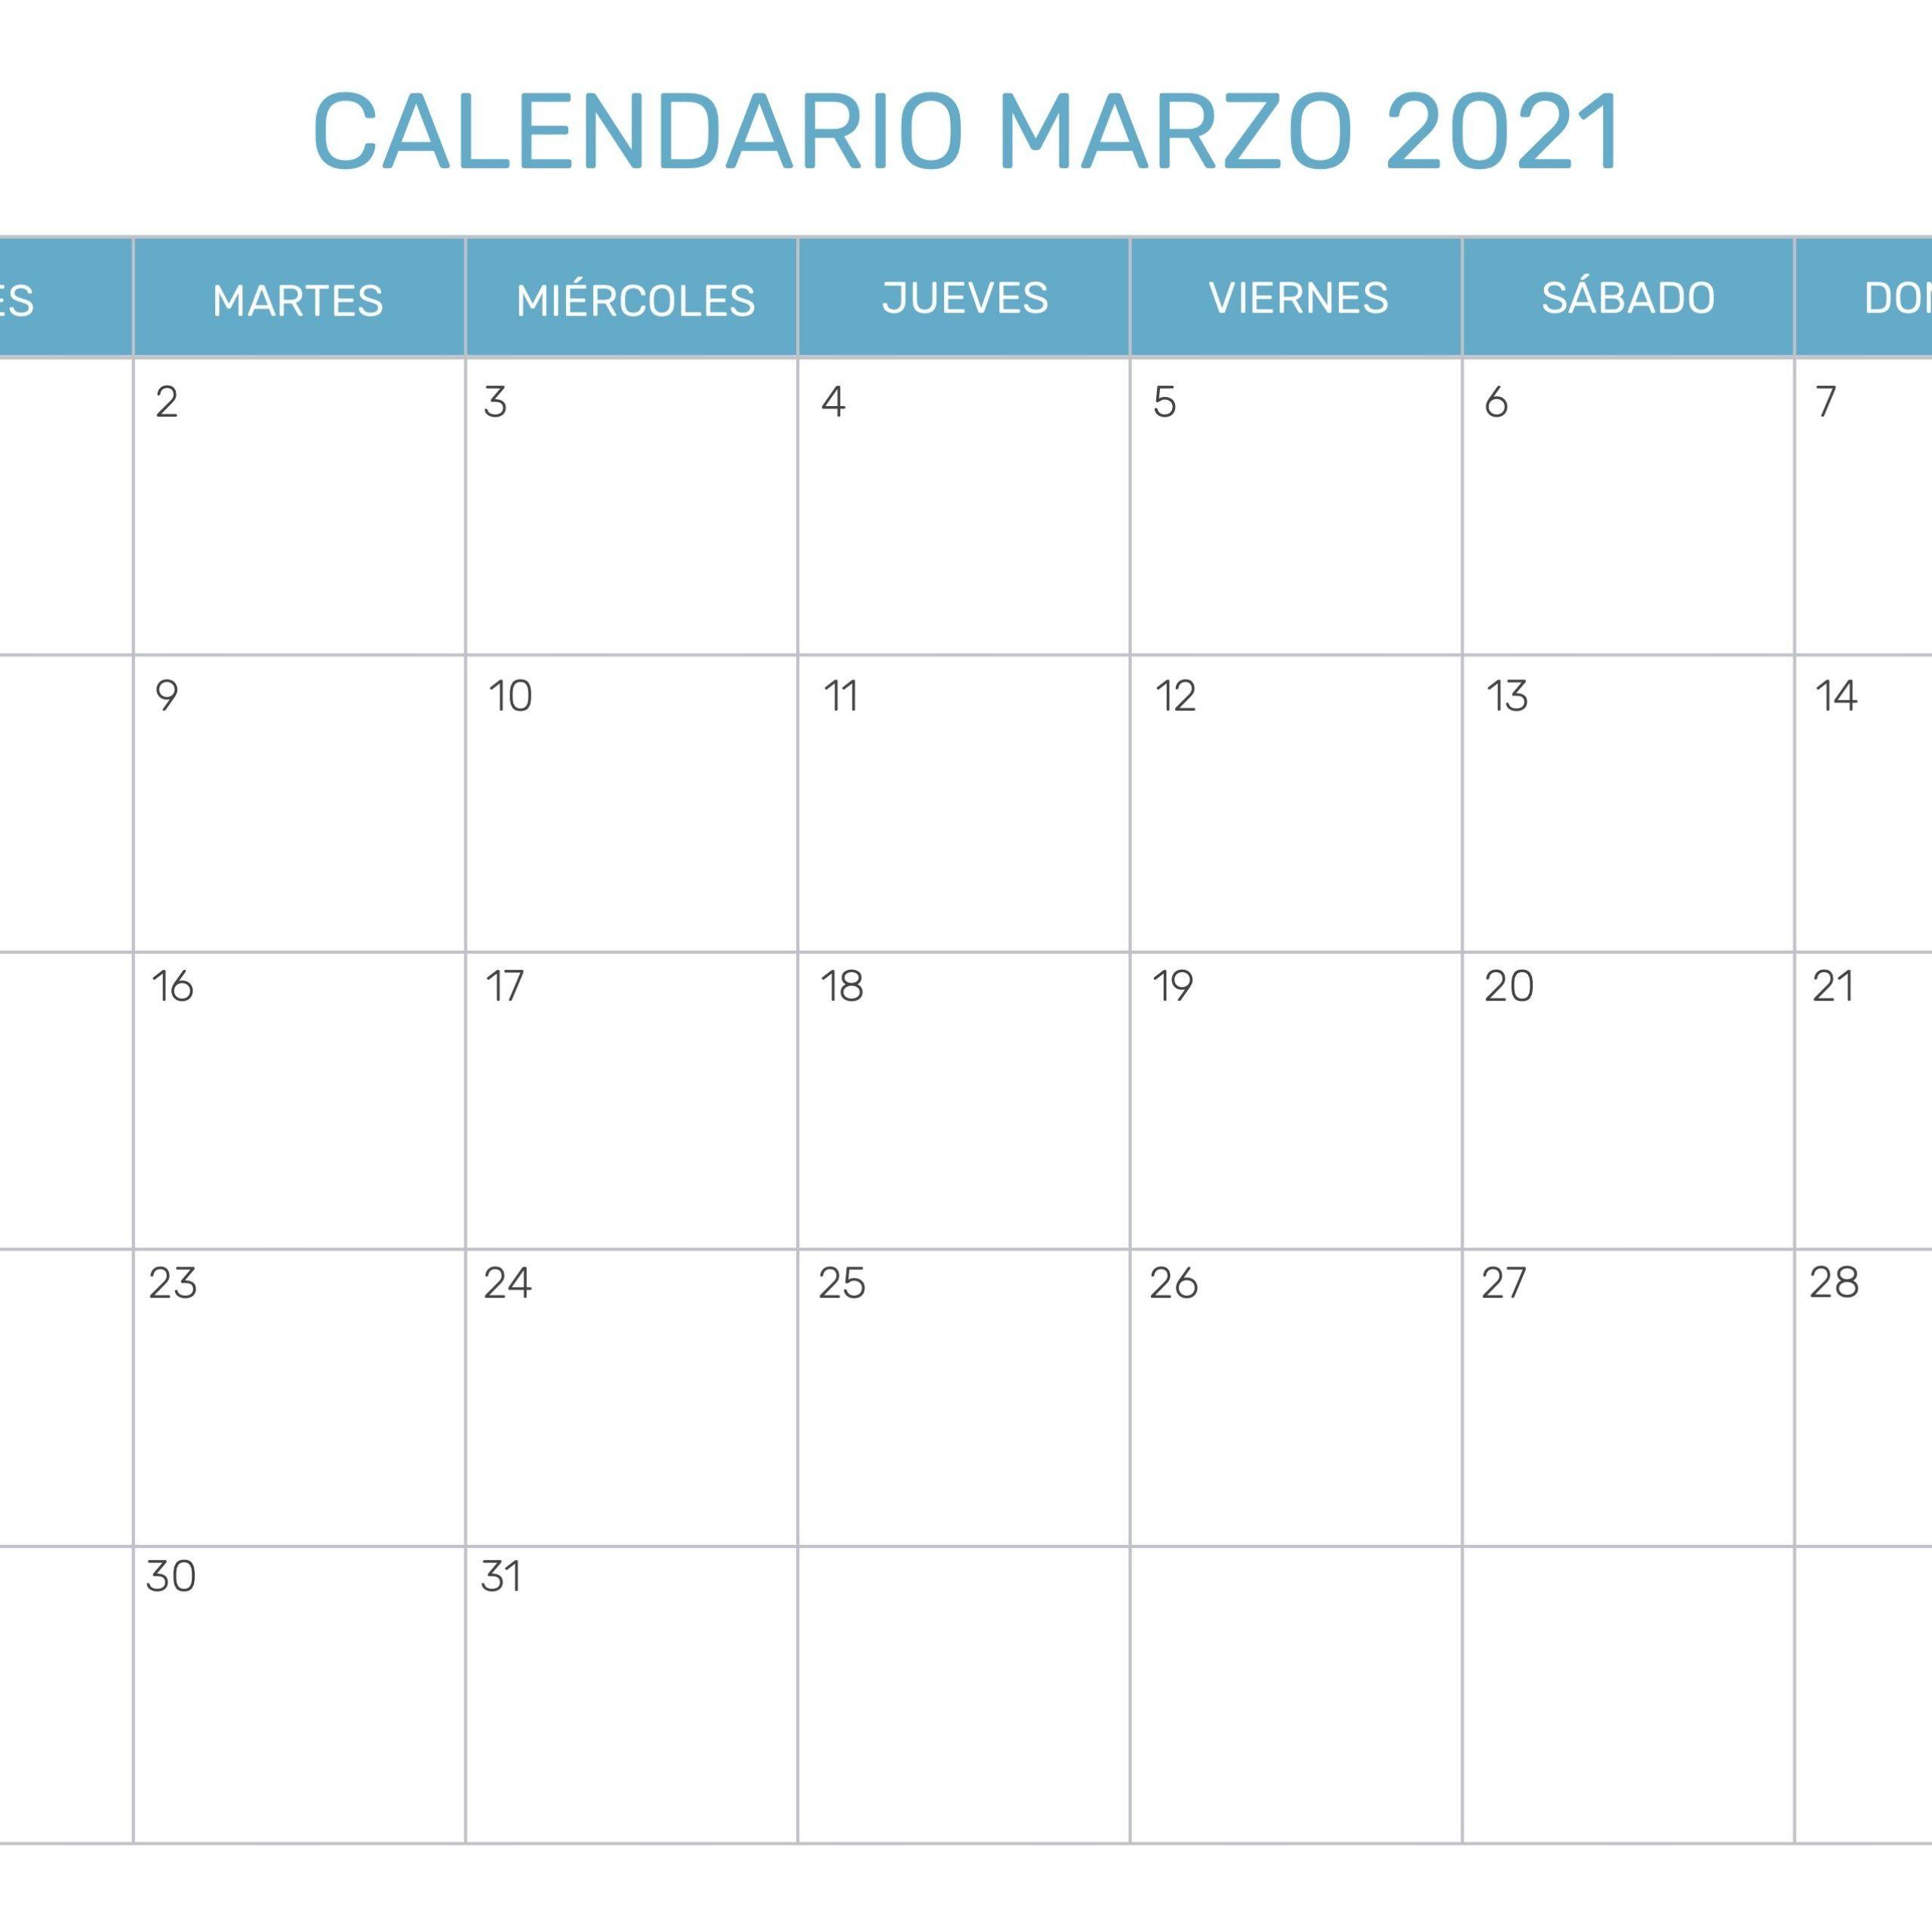 Calendario Diciembre 2020 Y Enero Febrero Marzo 2021 In 2020 In This Moment First Photograph The Incredibles